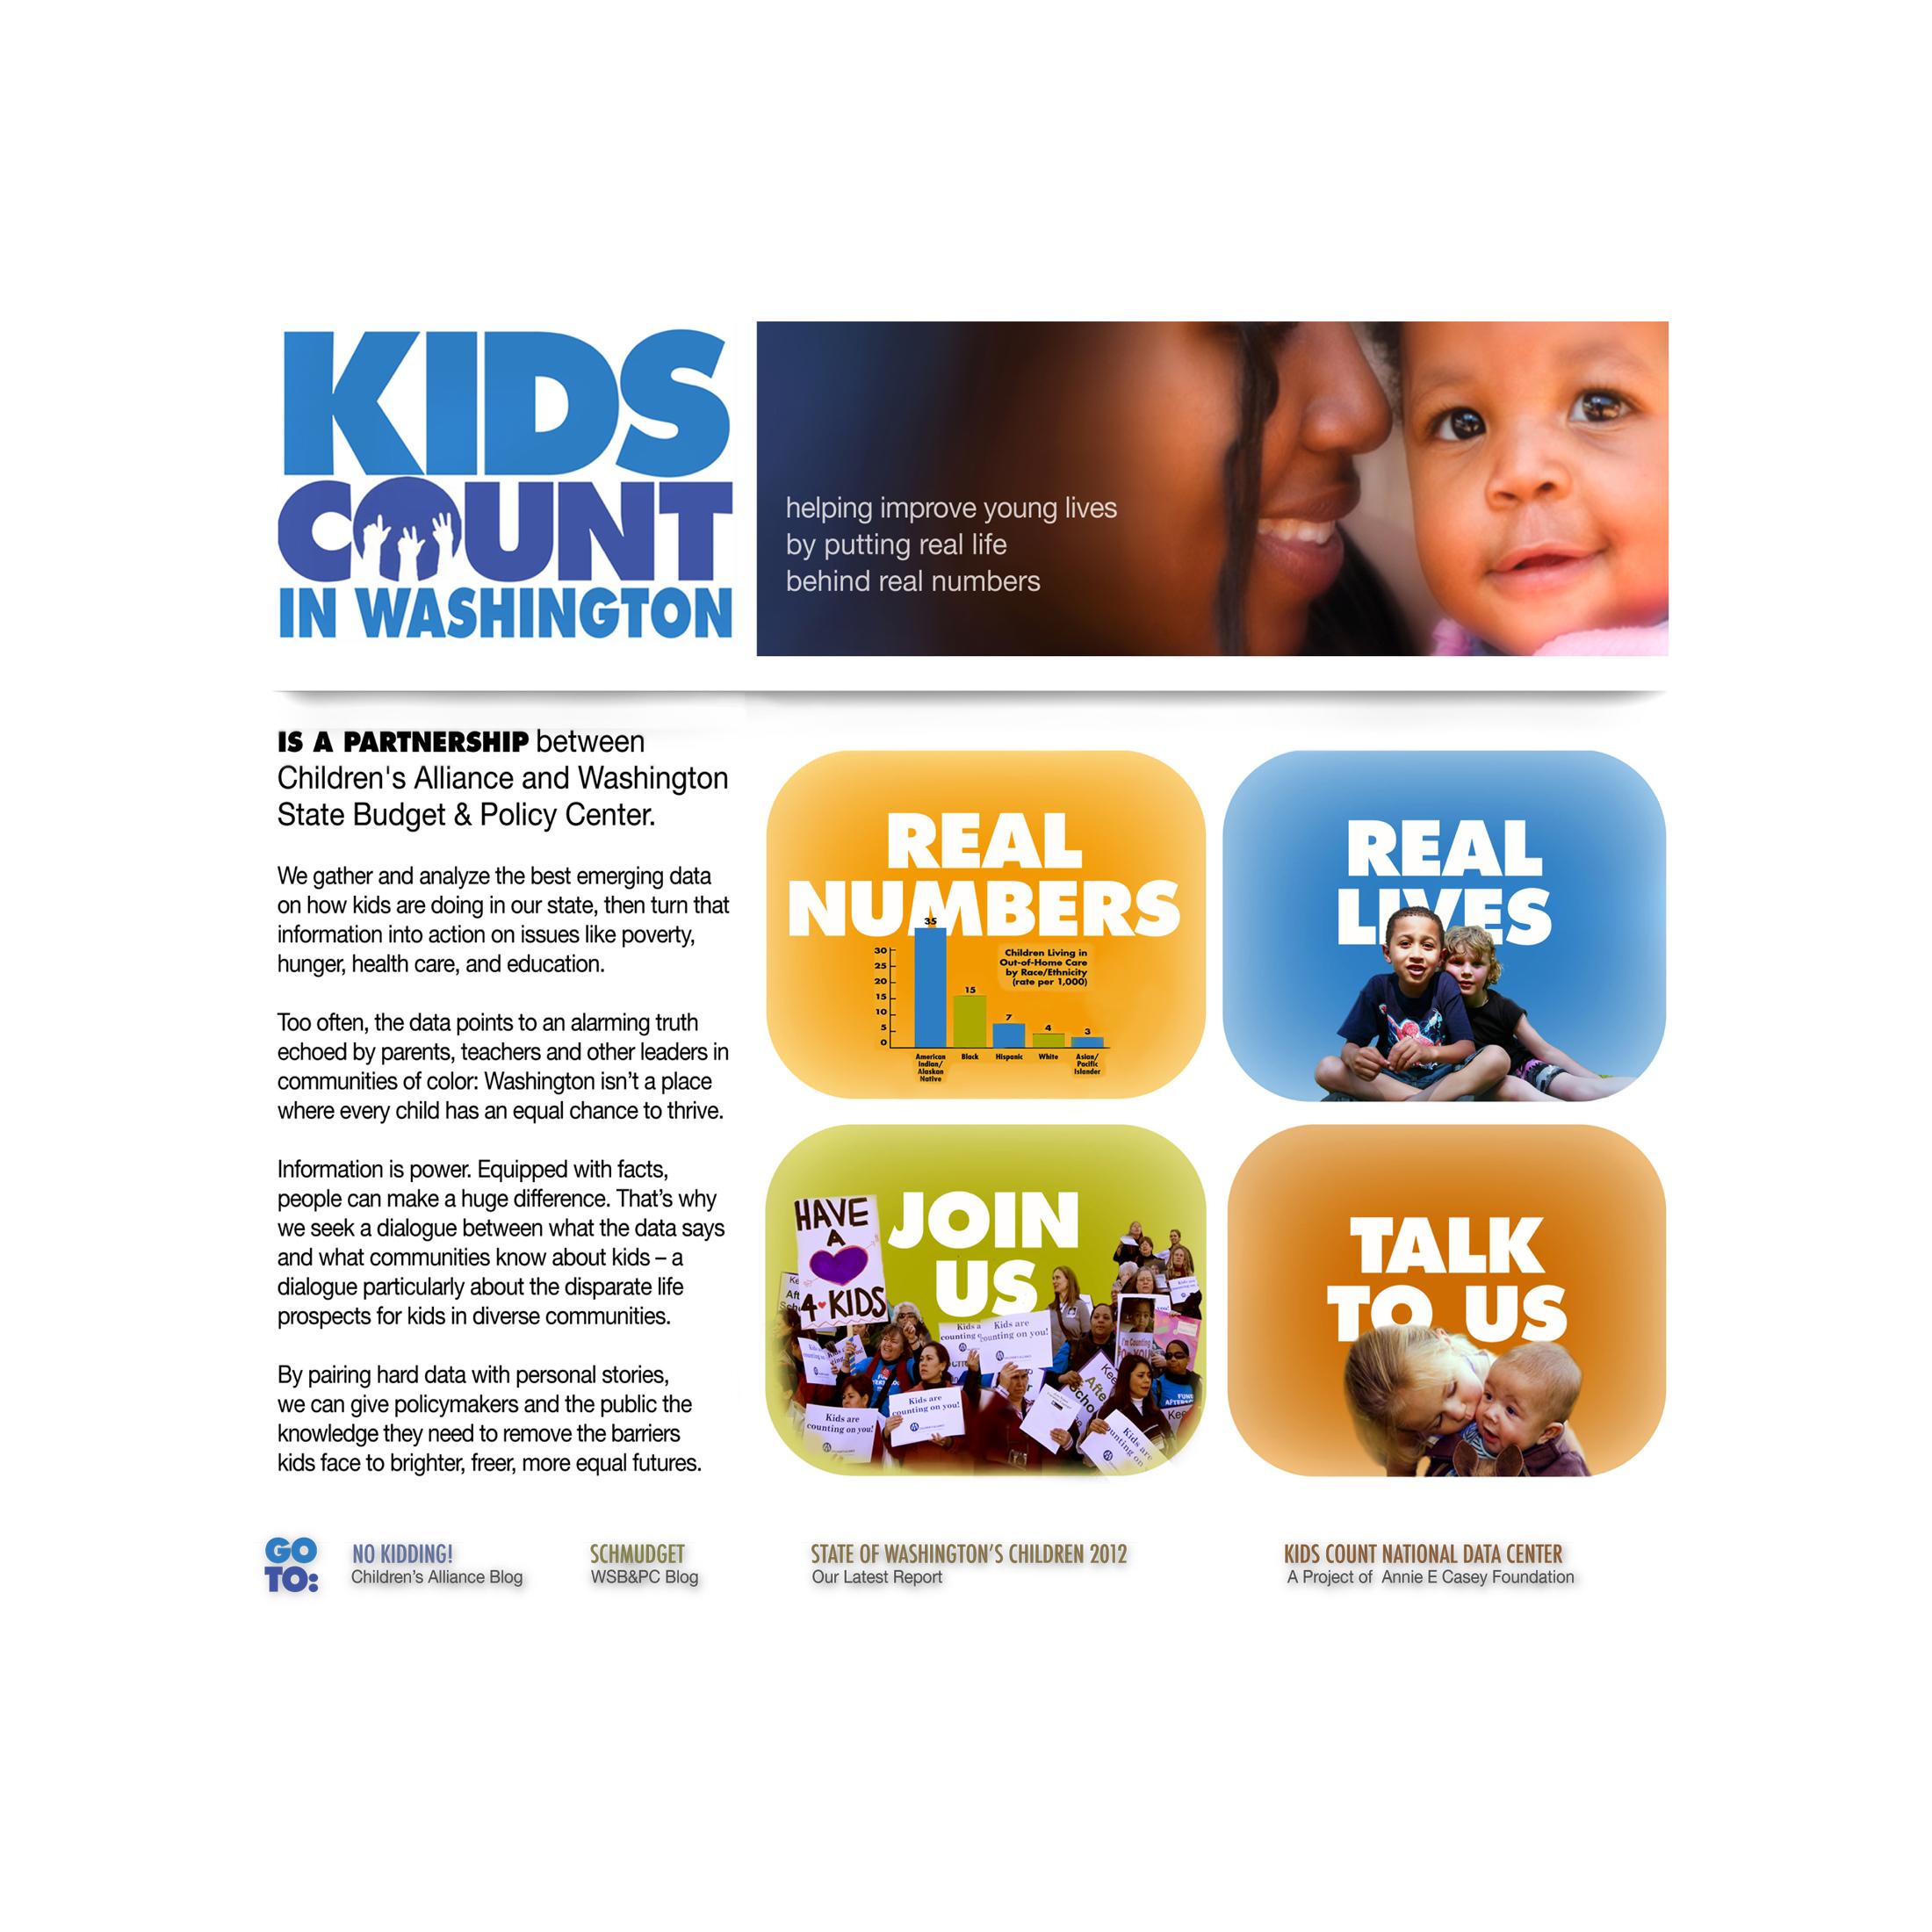 KidsCount_Website.jpg